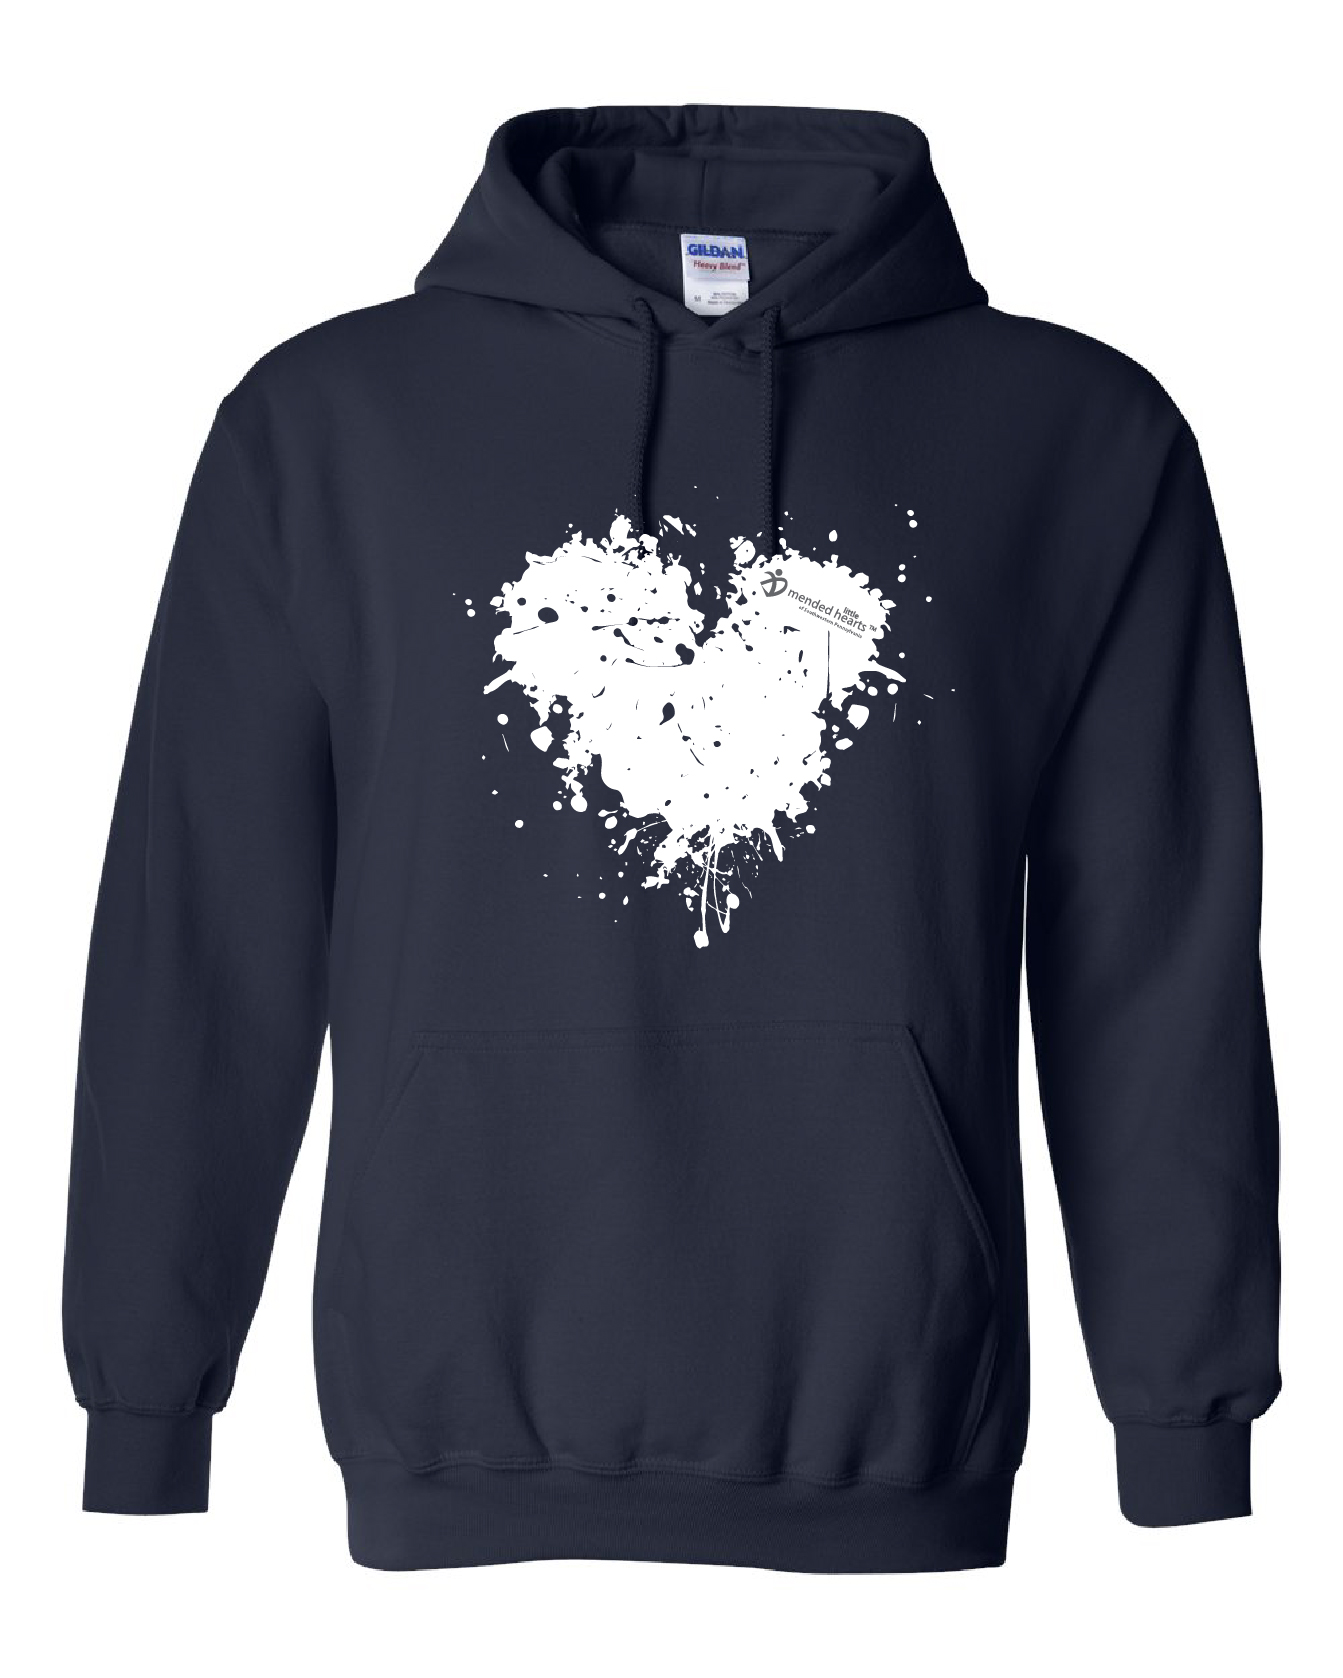 Splatter Heart Hooded Sweatshirt Available in Navy or Dark Heather